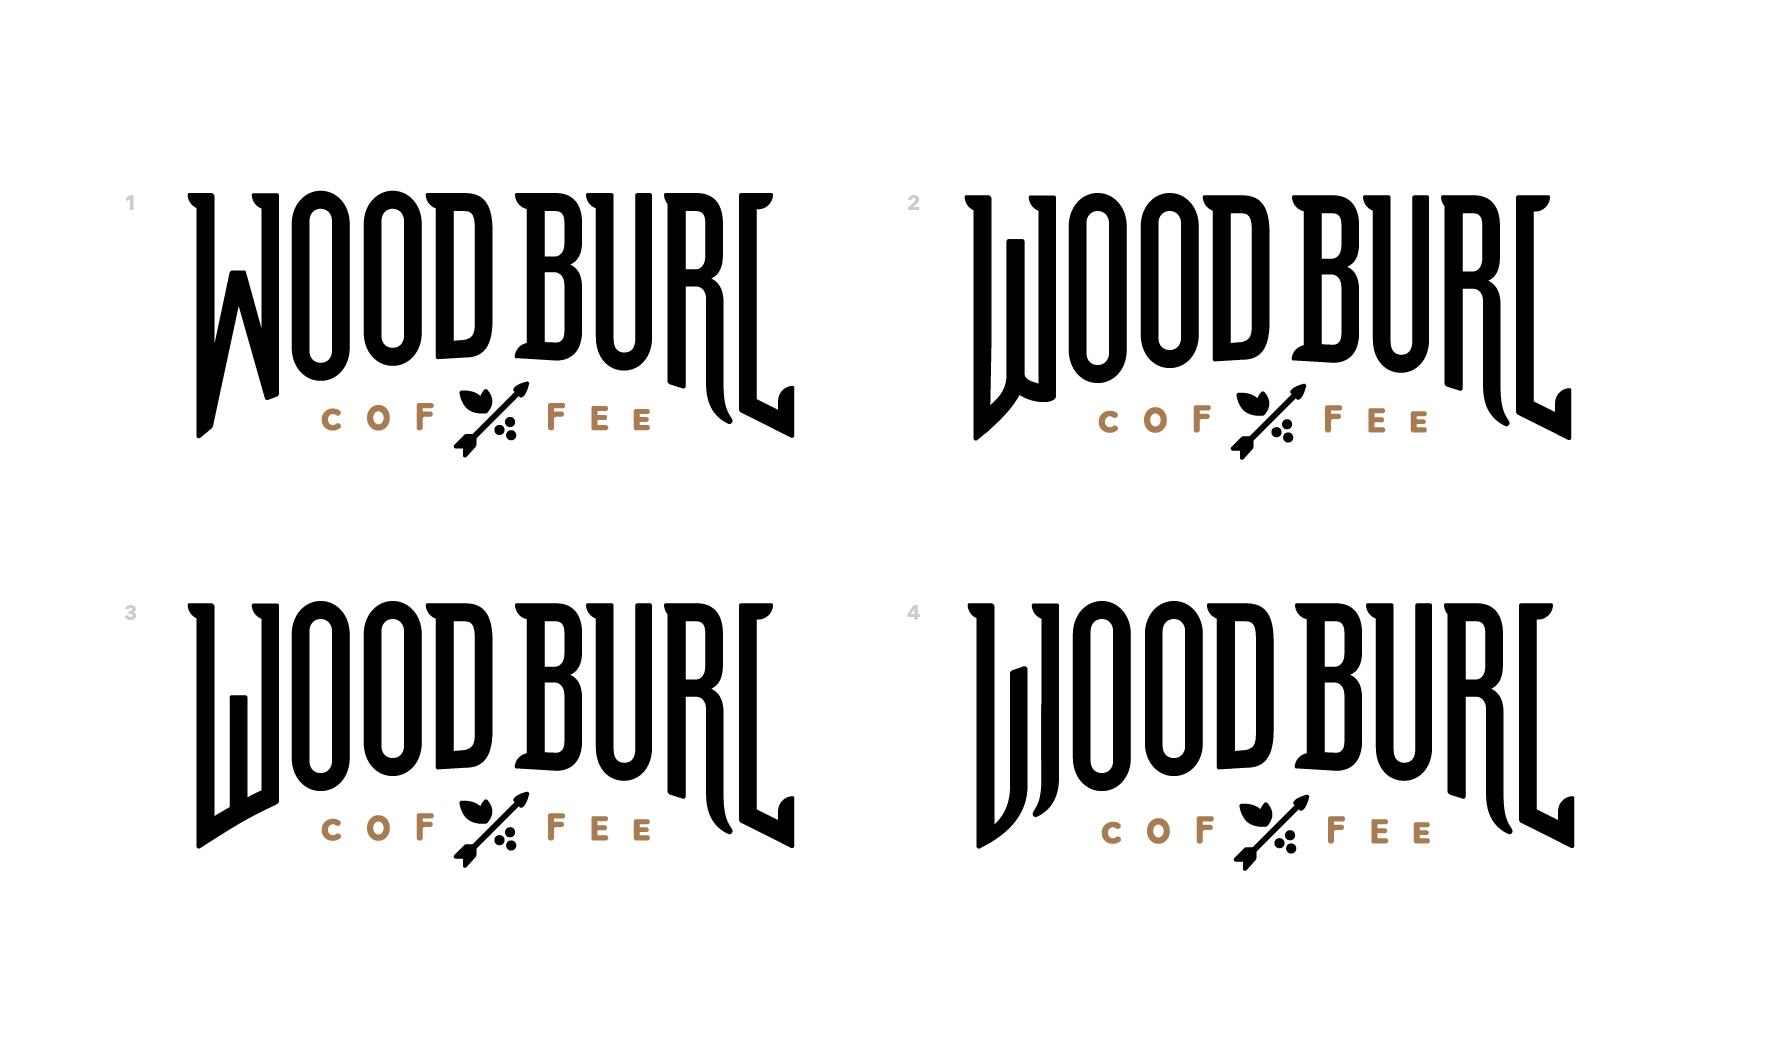 Woodburls